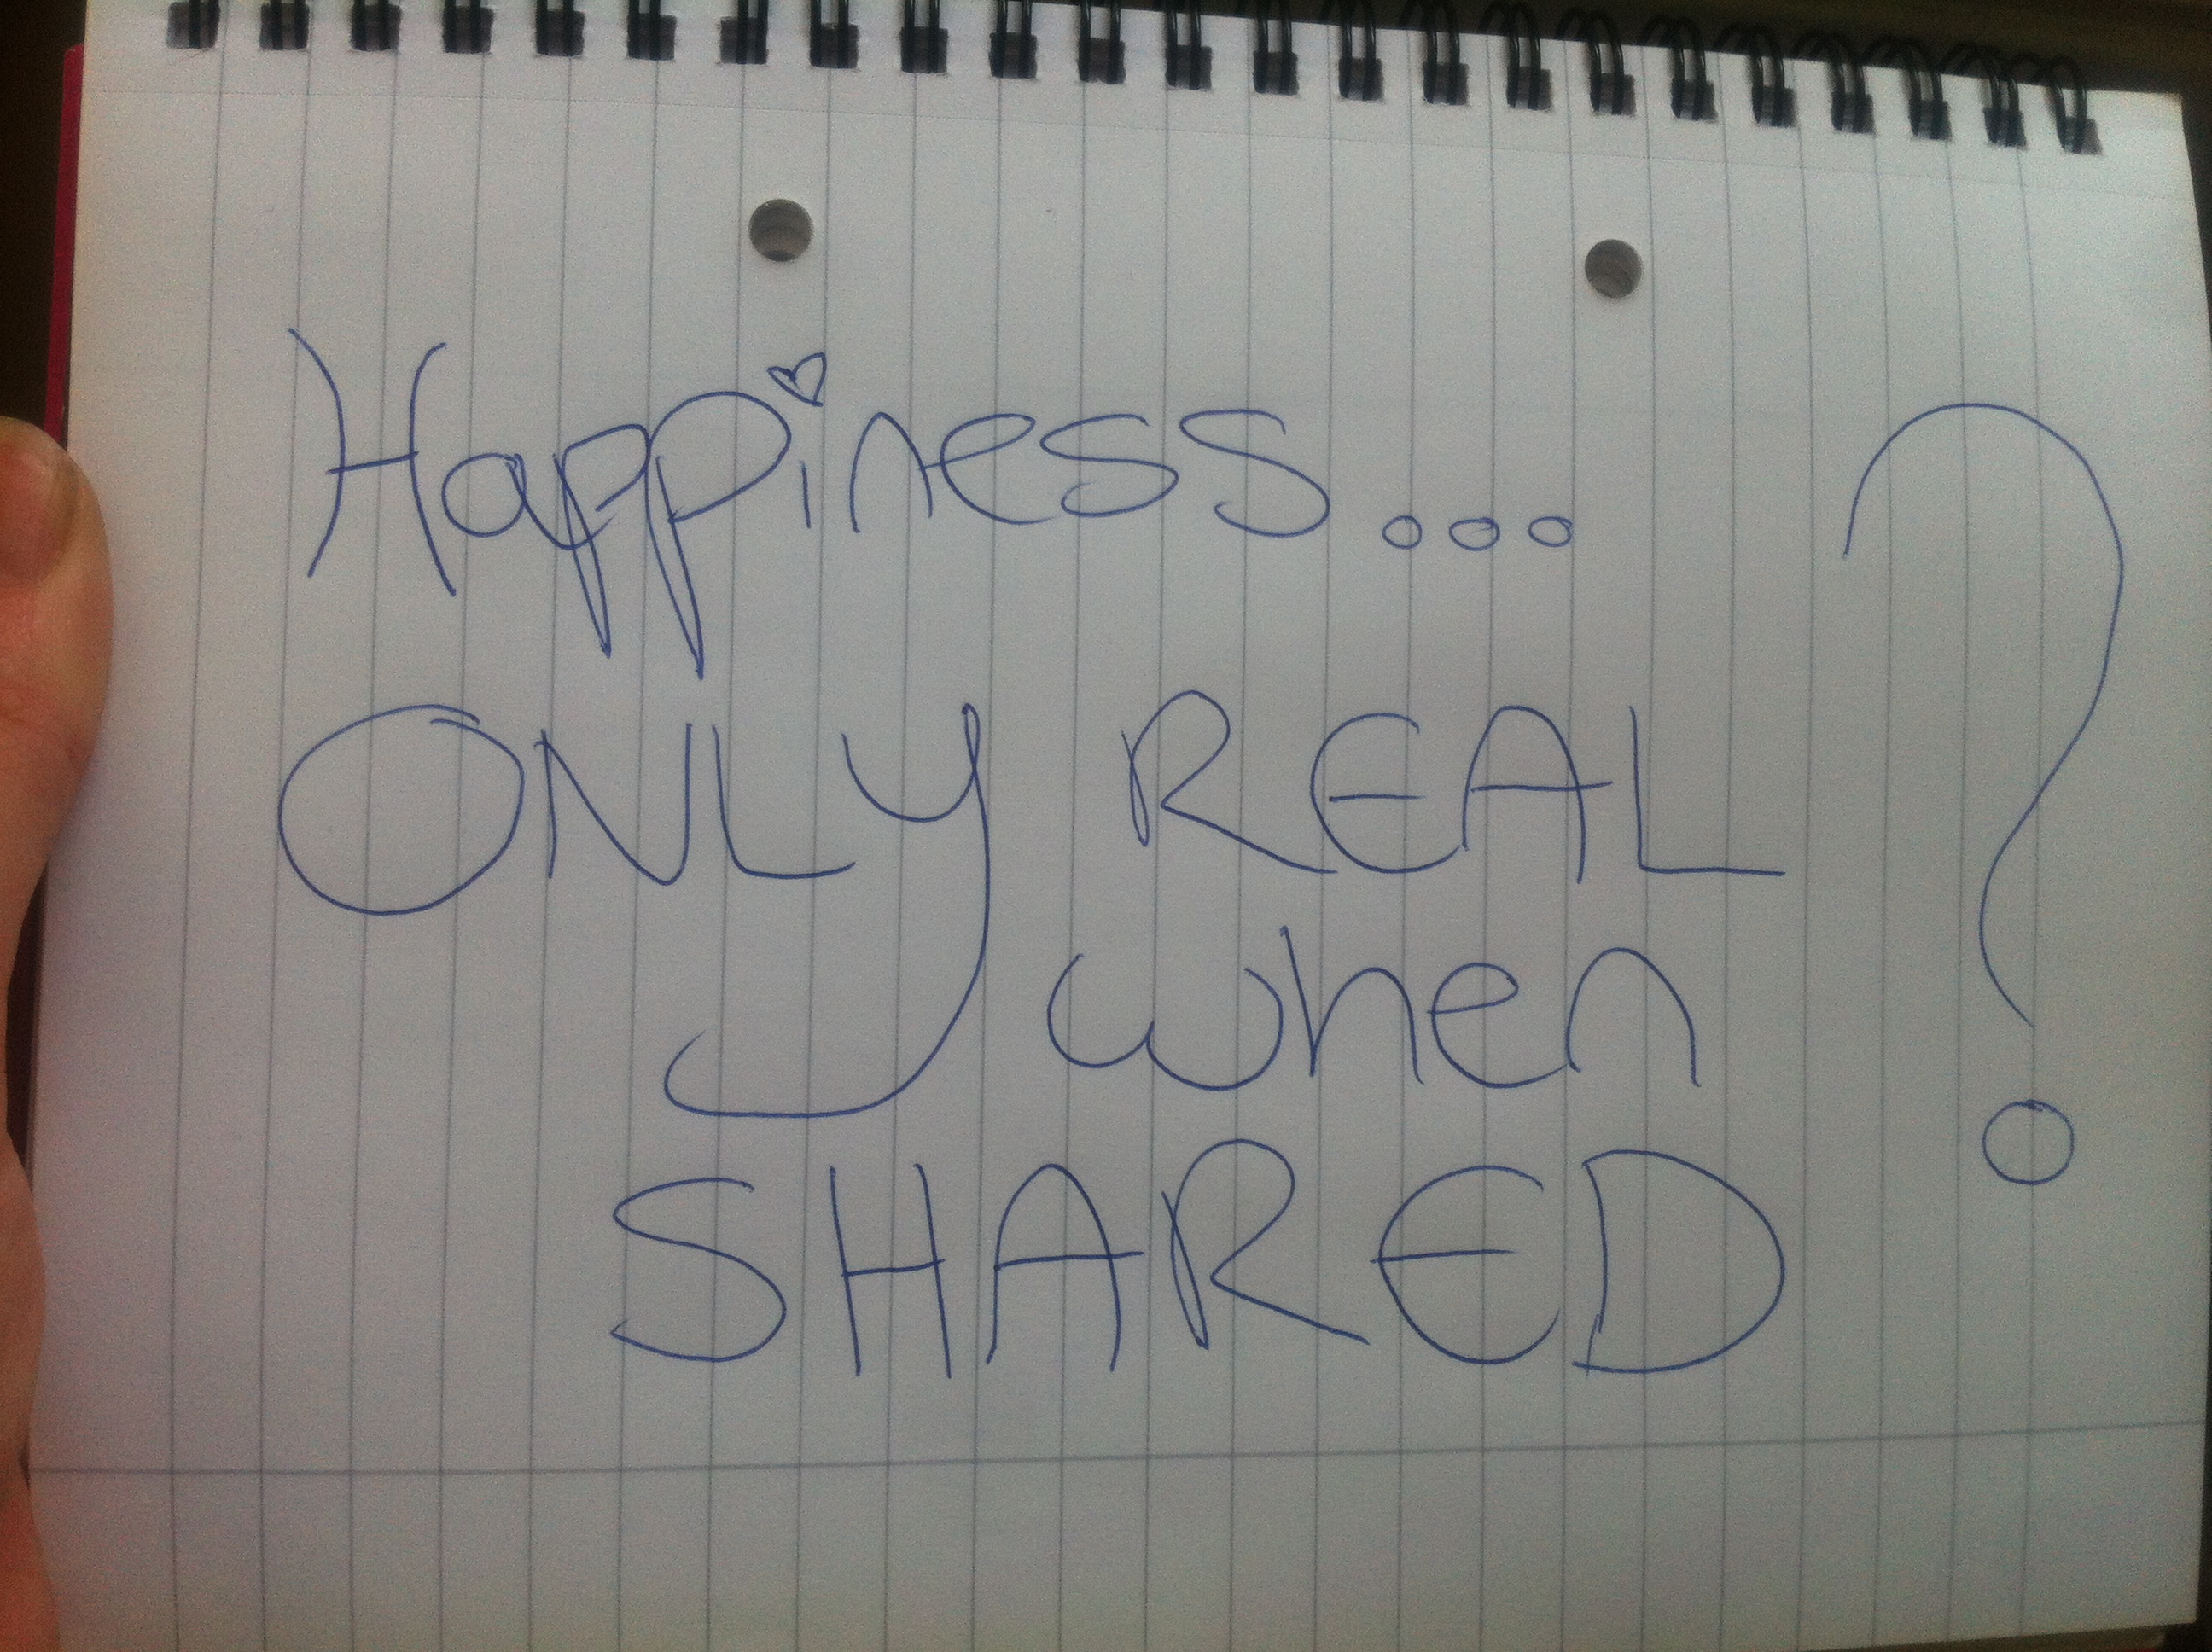 2013-07-14-happiness.jpg